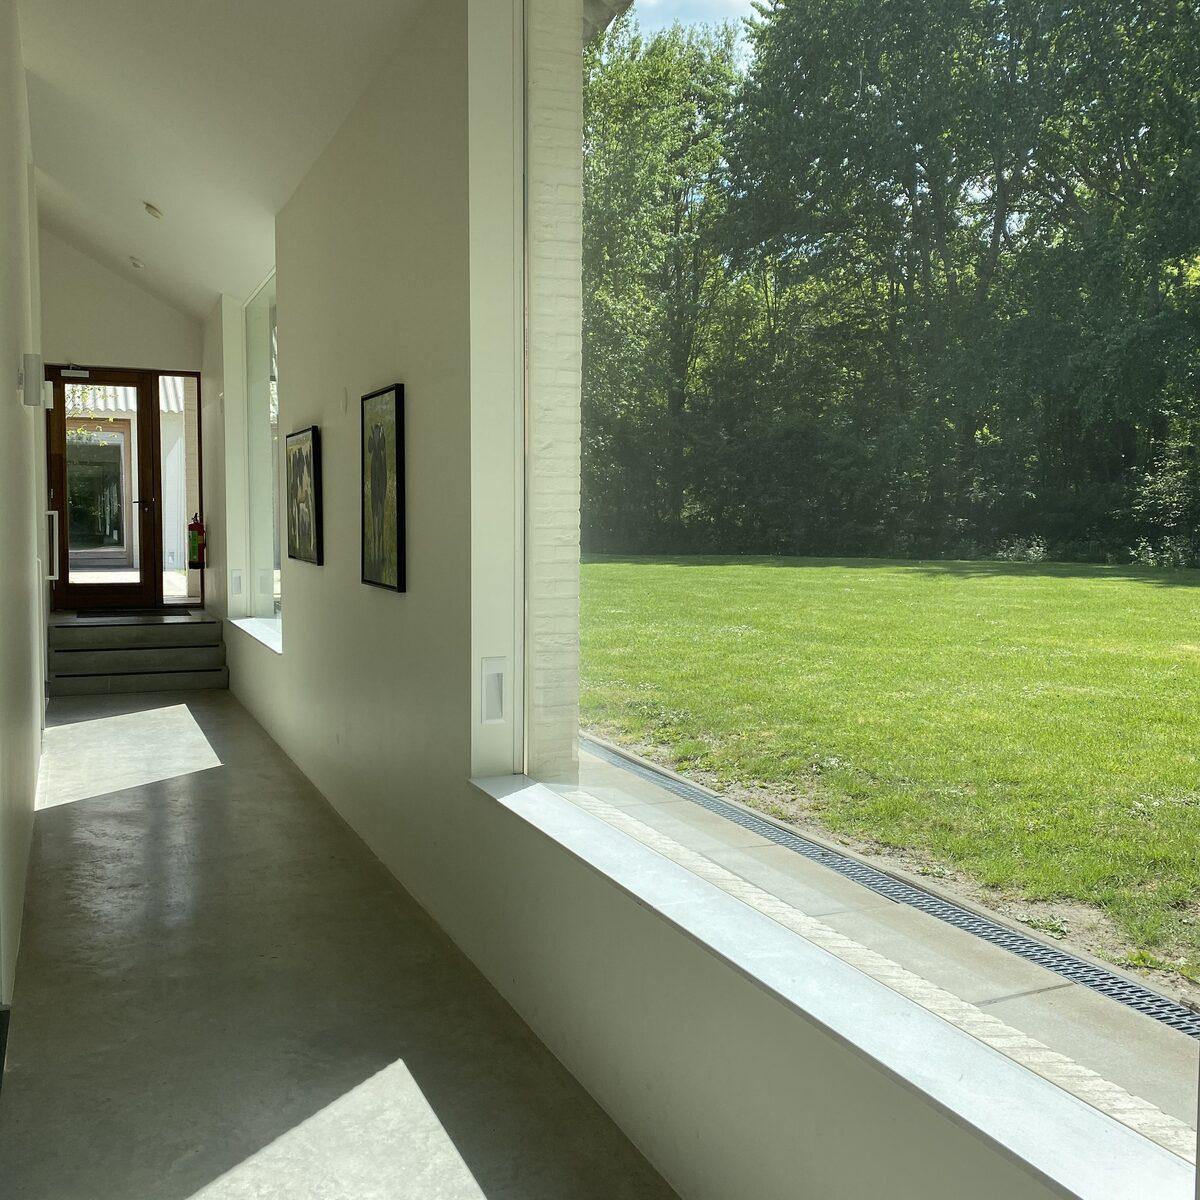 Studio's  - Valkenisseweg 61 | Groot-Valkenisse